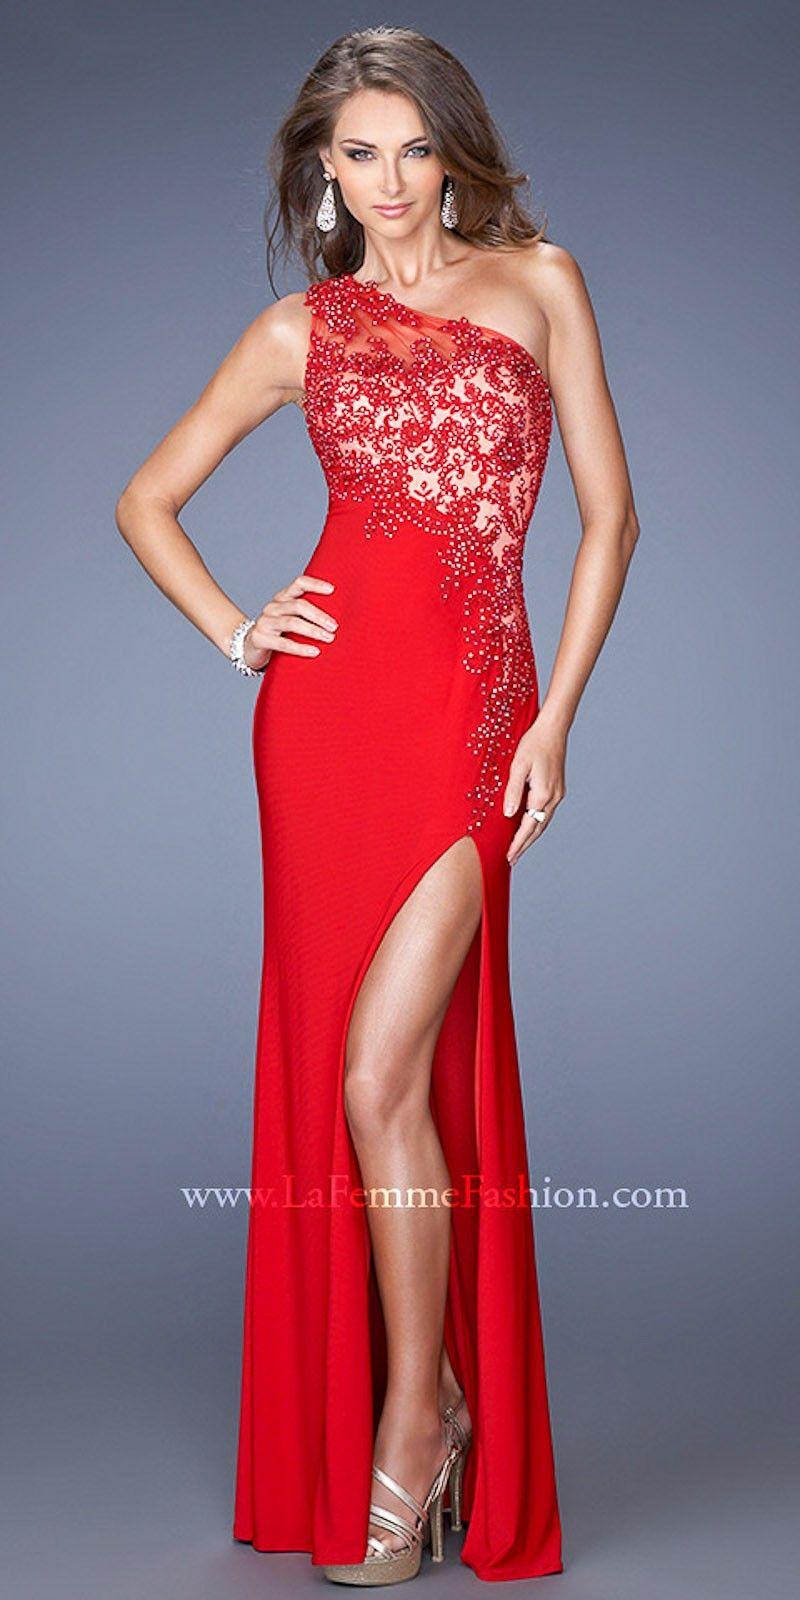 Black Lace One Shoulder Prom Dress Jqzzst My Fashion Studio